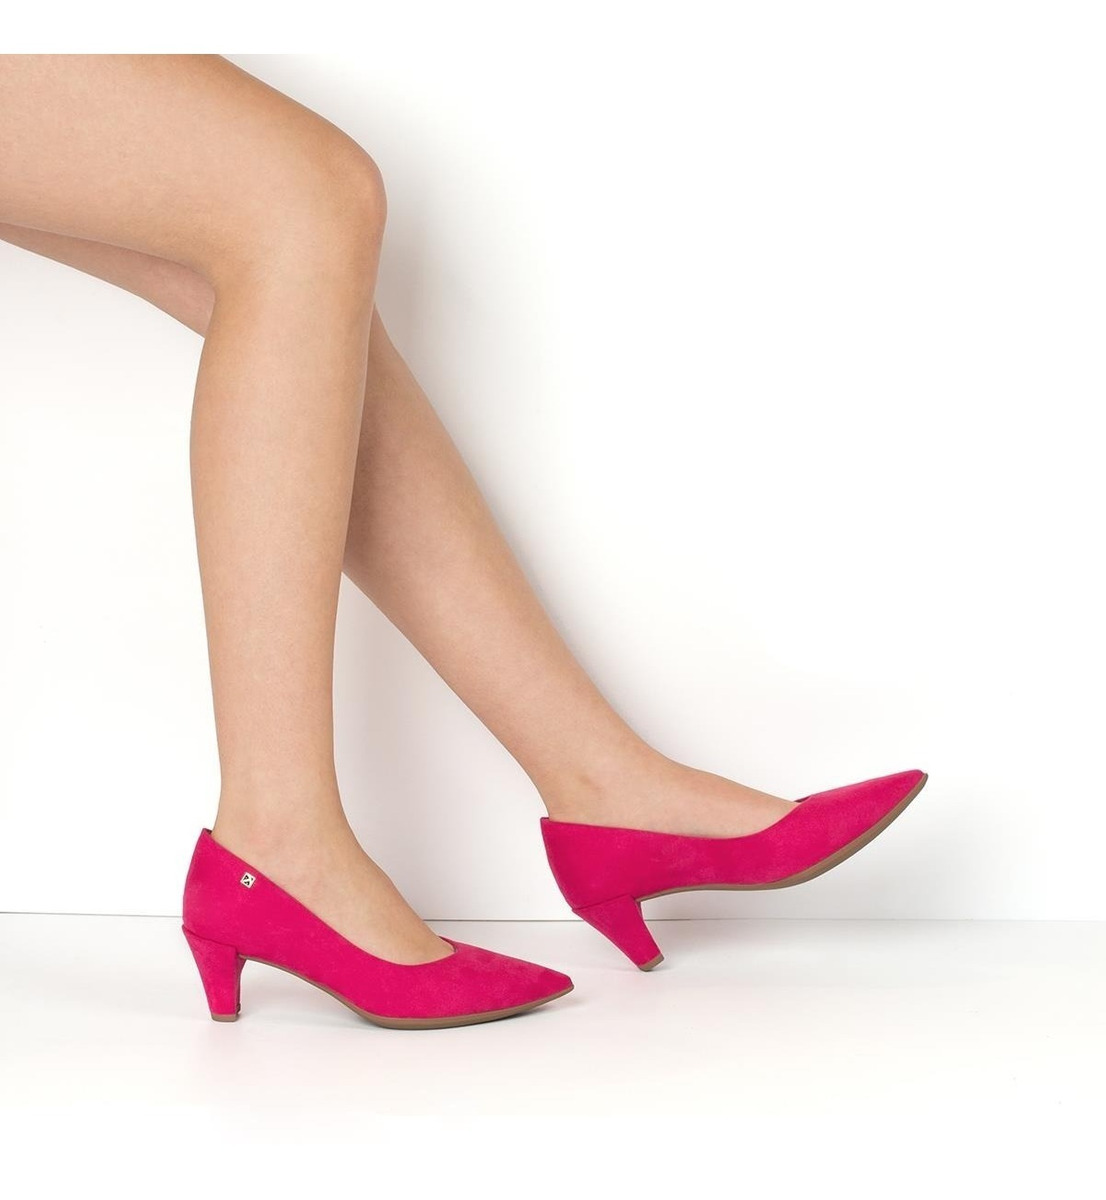 afd5a2fd41 Scarpin Salto Alto Piccadilly Sapato Pink Lançamento - R$ 163,90 em ...